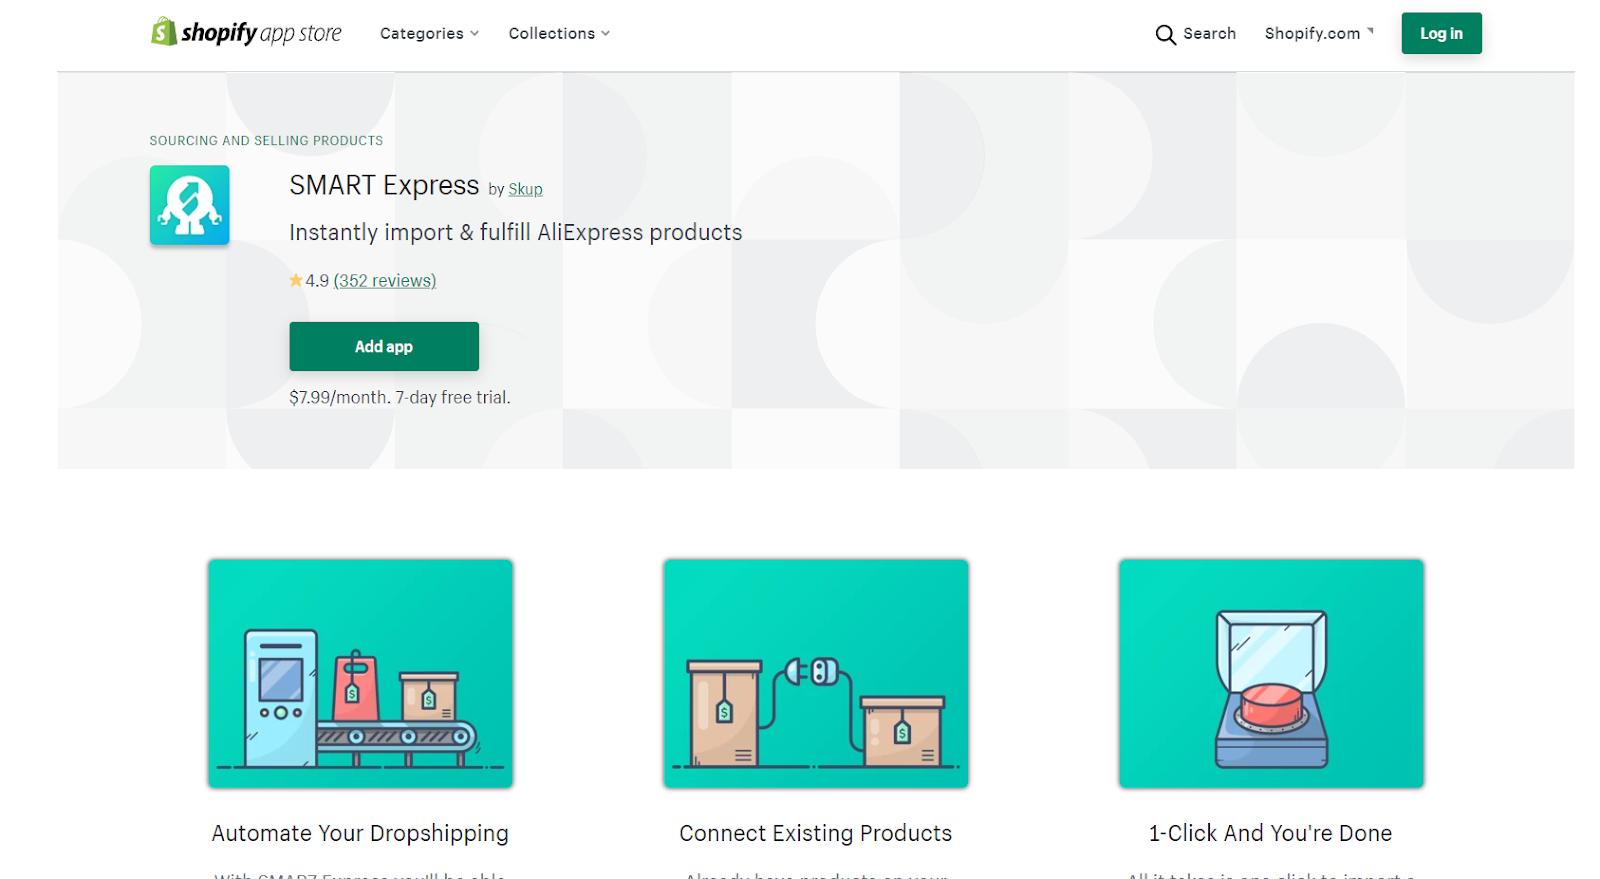 smar7 express dropshipping app